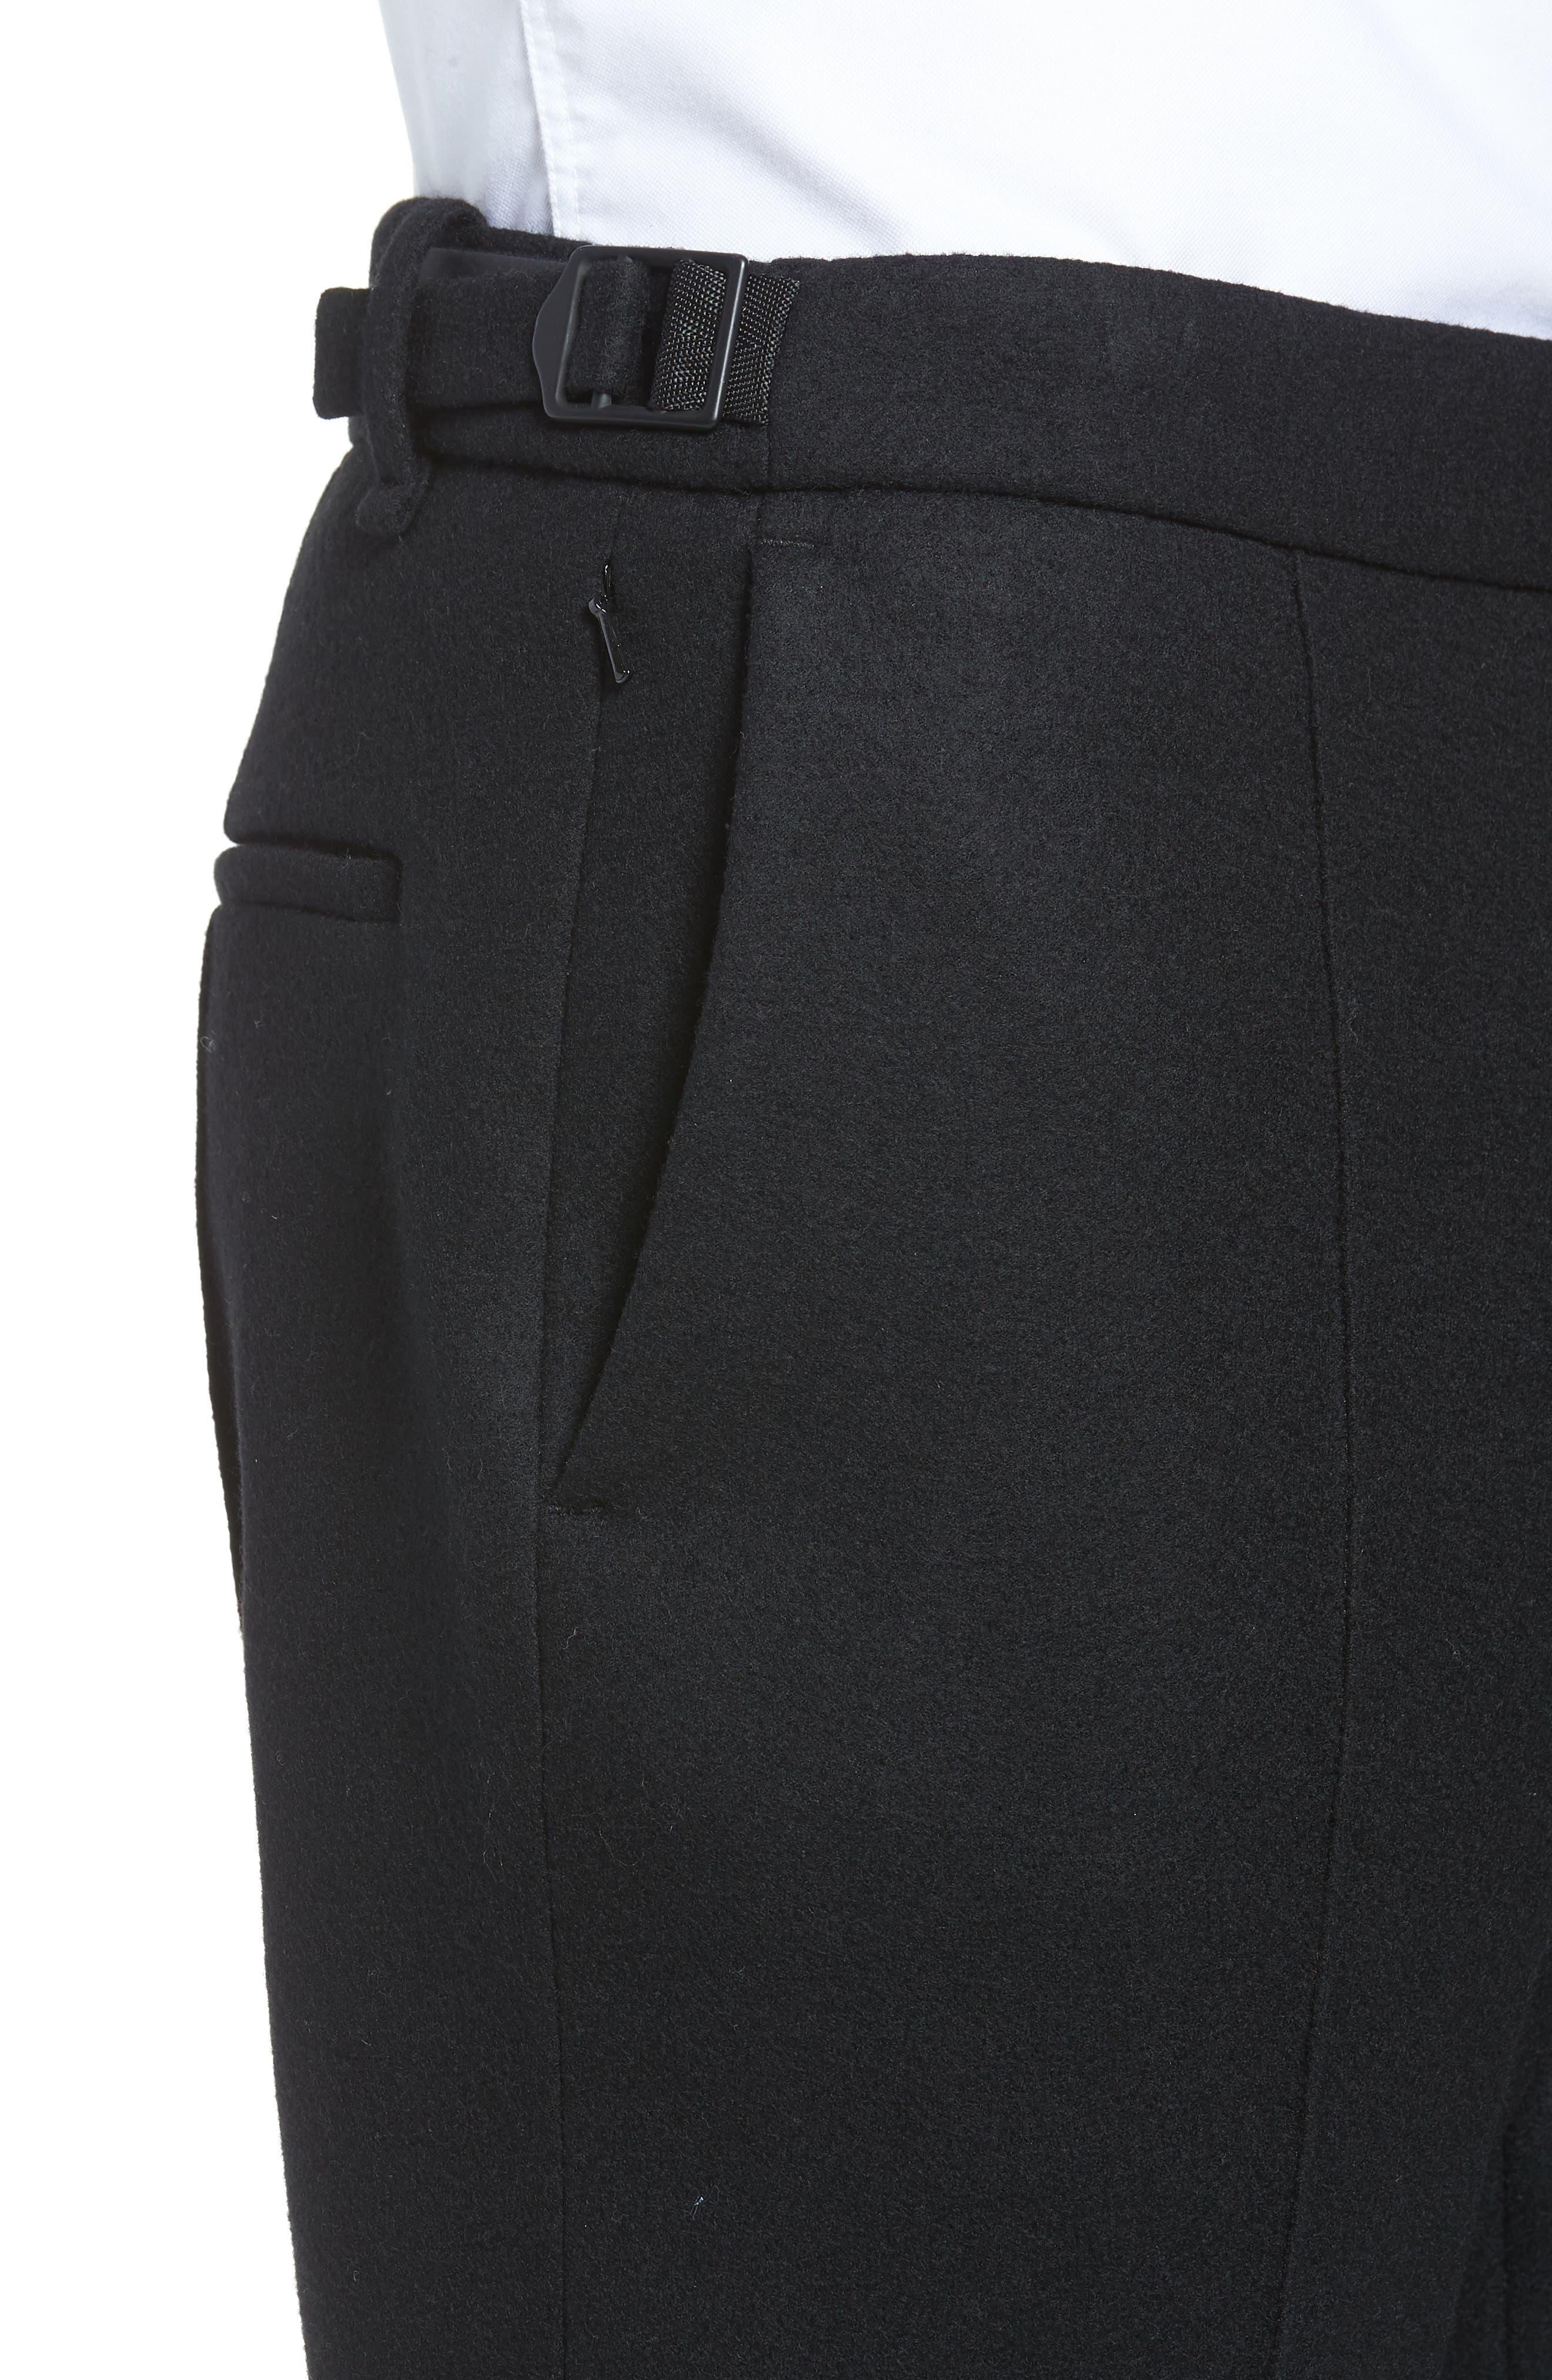 Sector Slim Fit Wool Jersey Pants,                             Alternate thumbnail 4, color,                             BLACK